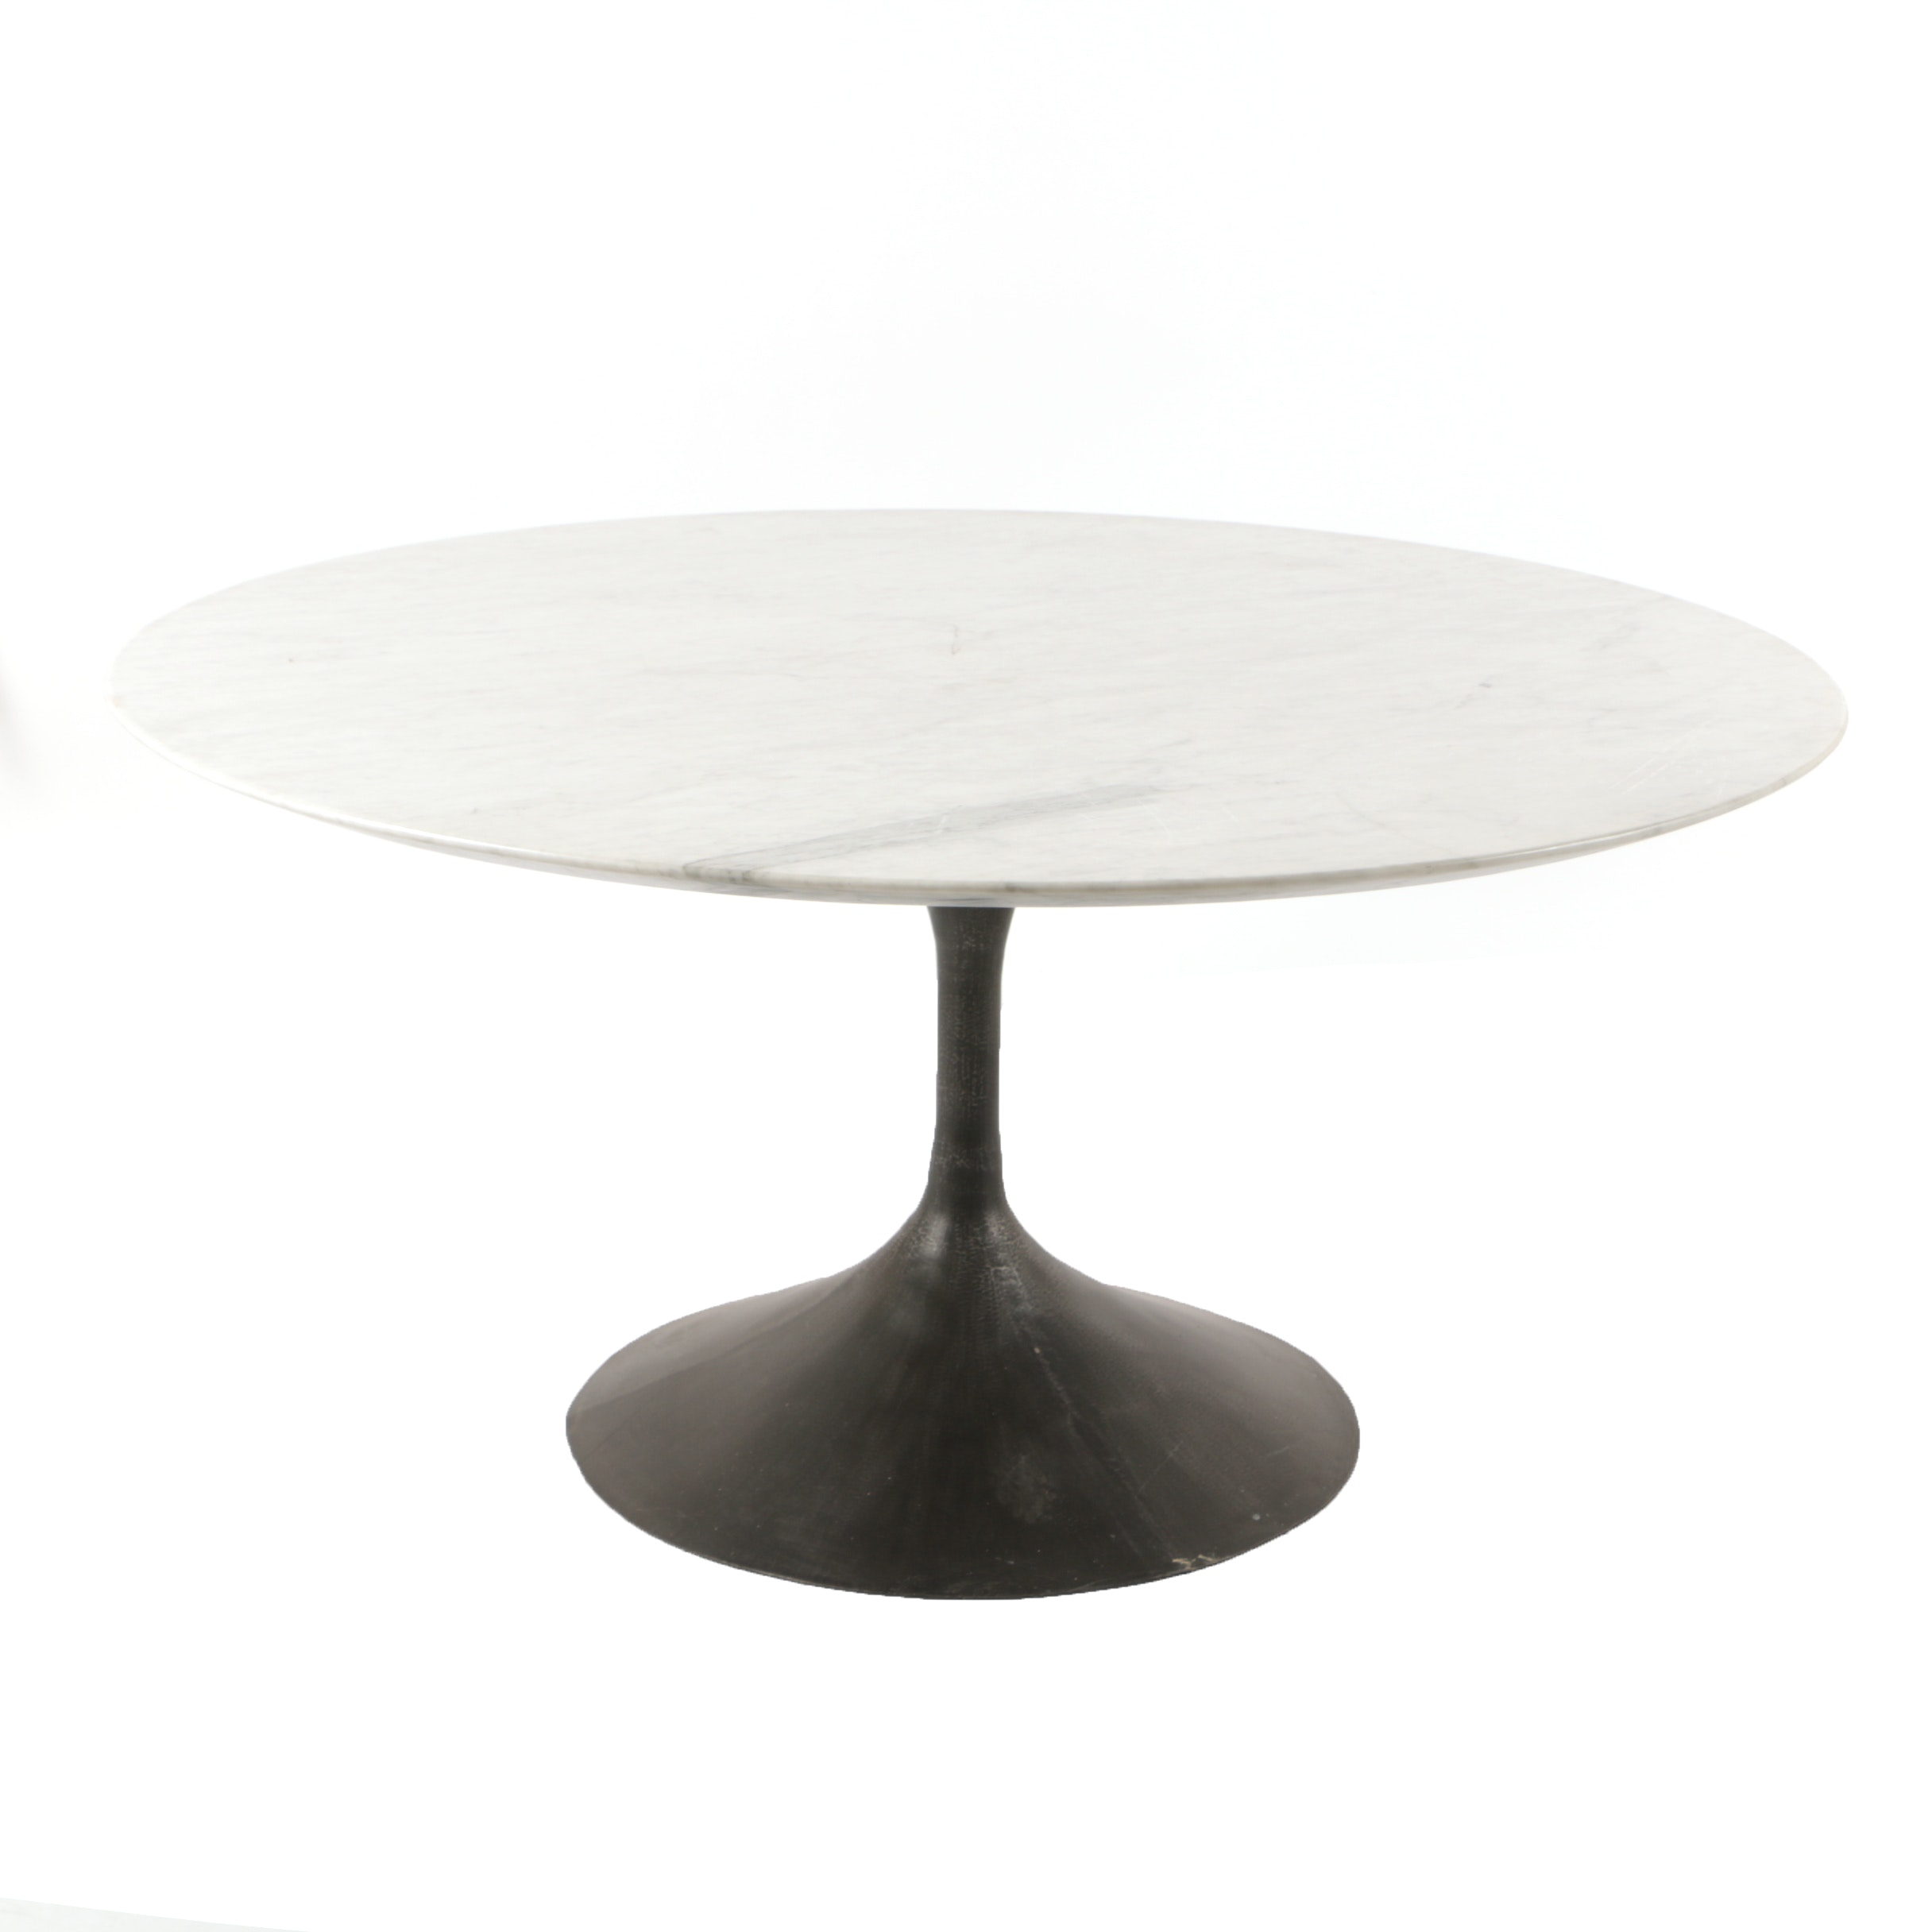 "Restoration Hardware ""Aero"" Marble Top Dining Table"